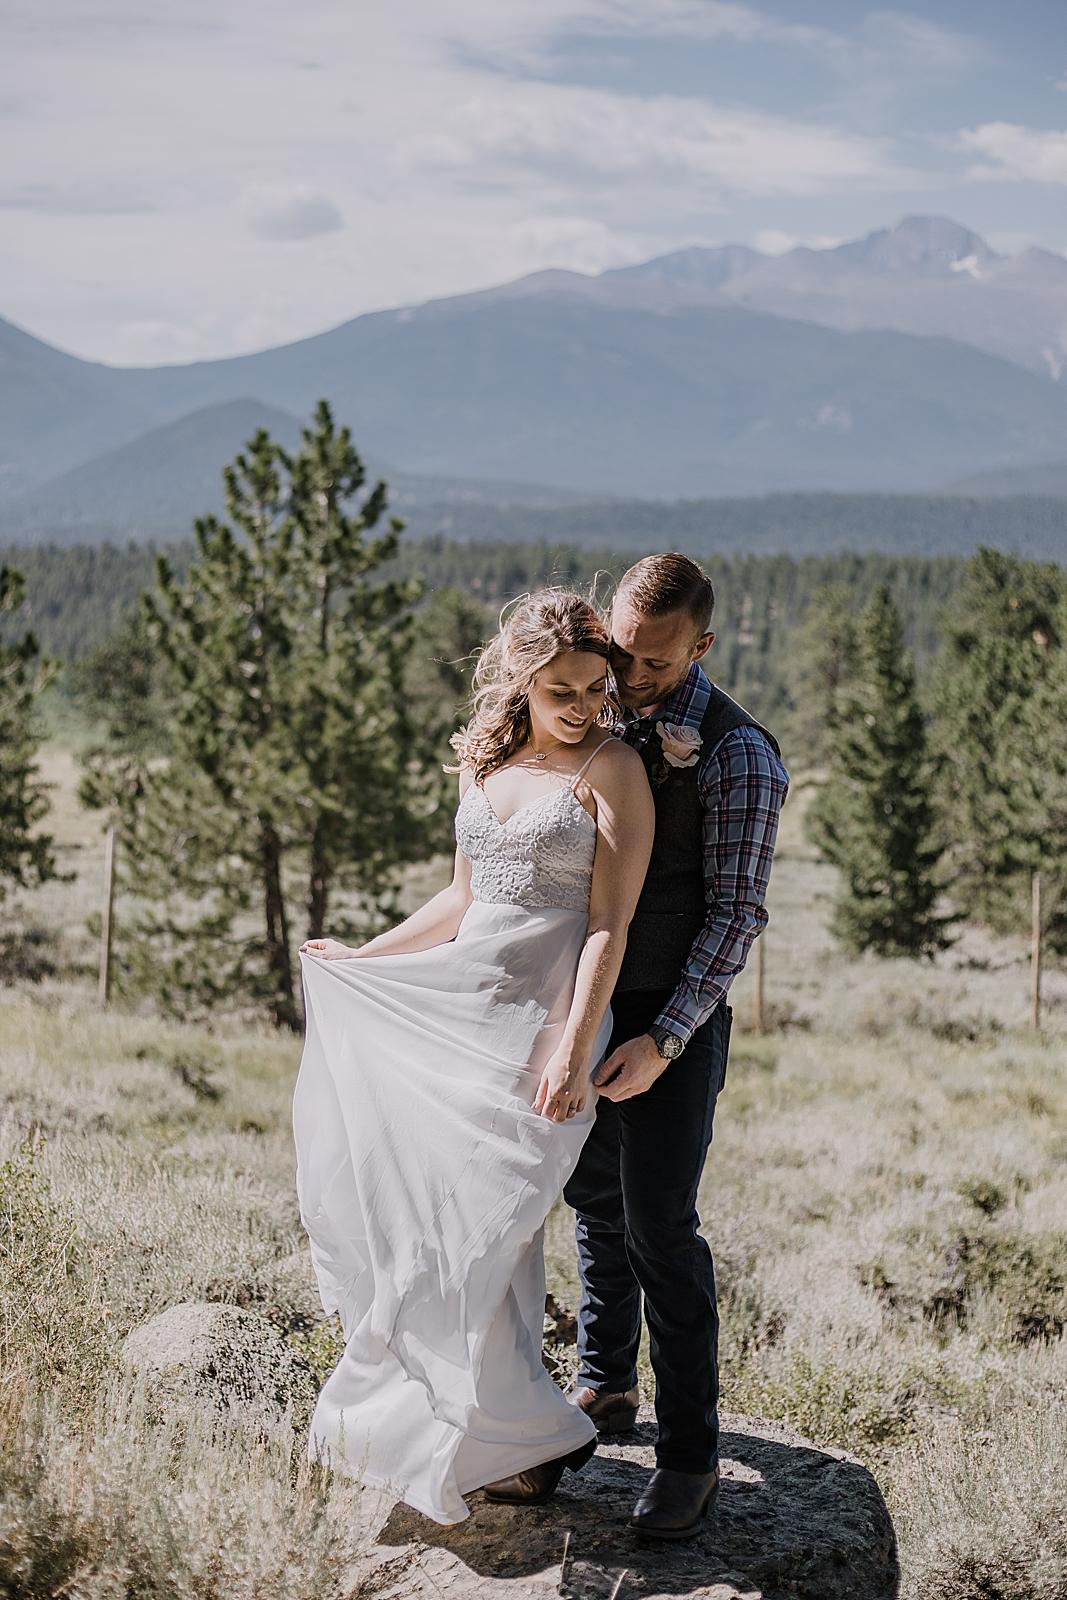 bridal attire, RMNP elopement ceremony, rocky mountain national park elopement, 3M curves elopement, self solemnizing, self solemnization, long's peak, summer elopement, estes park elopement